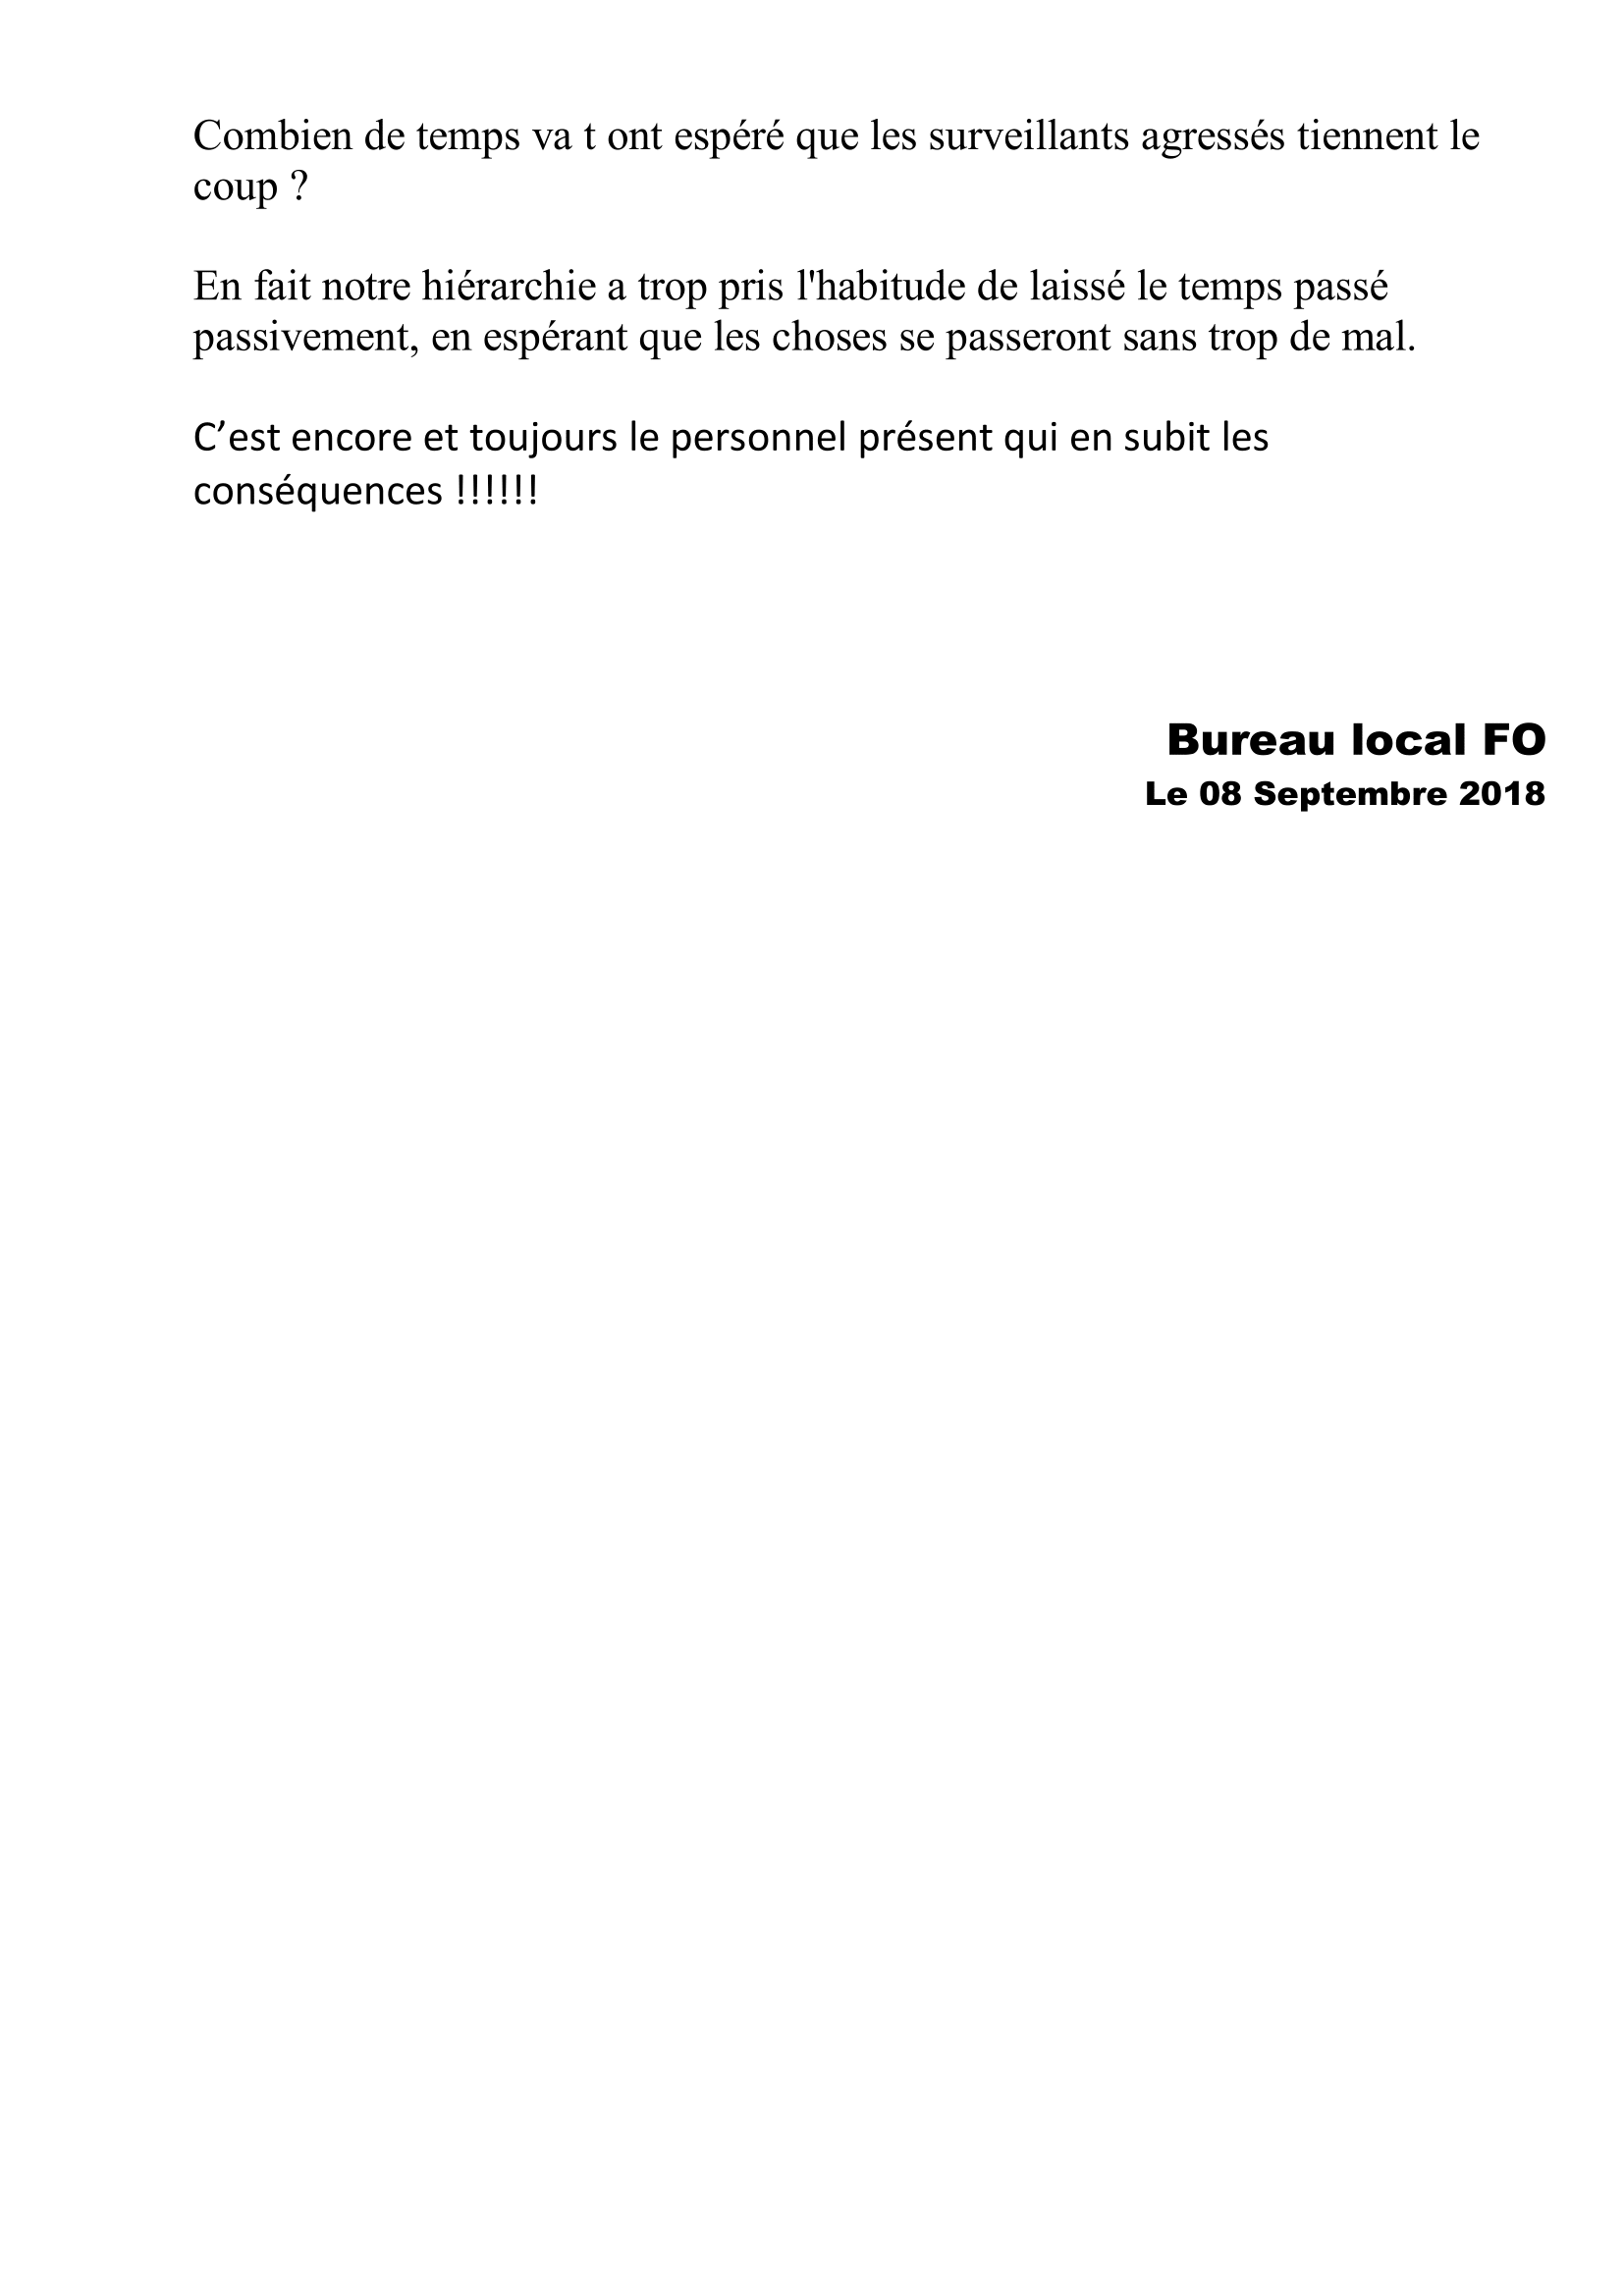 Agression QD 8 septembre 2018-2